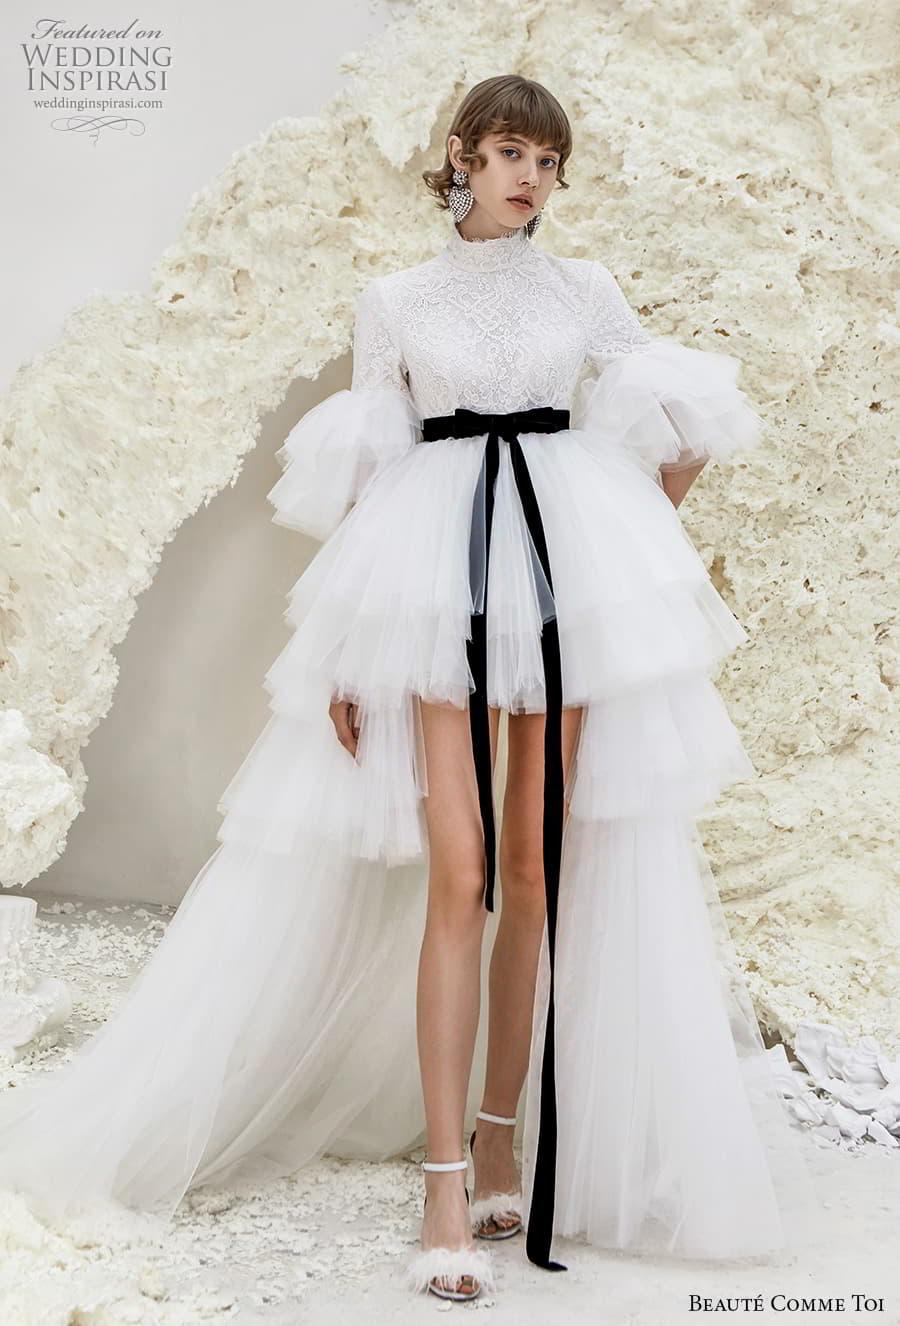 beaute comme toi spring 2022 bridal half poet sleeves high neck heavily embellished bodice short wedding dress a line overskirt covered lace back chapel train (karrisa) mv